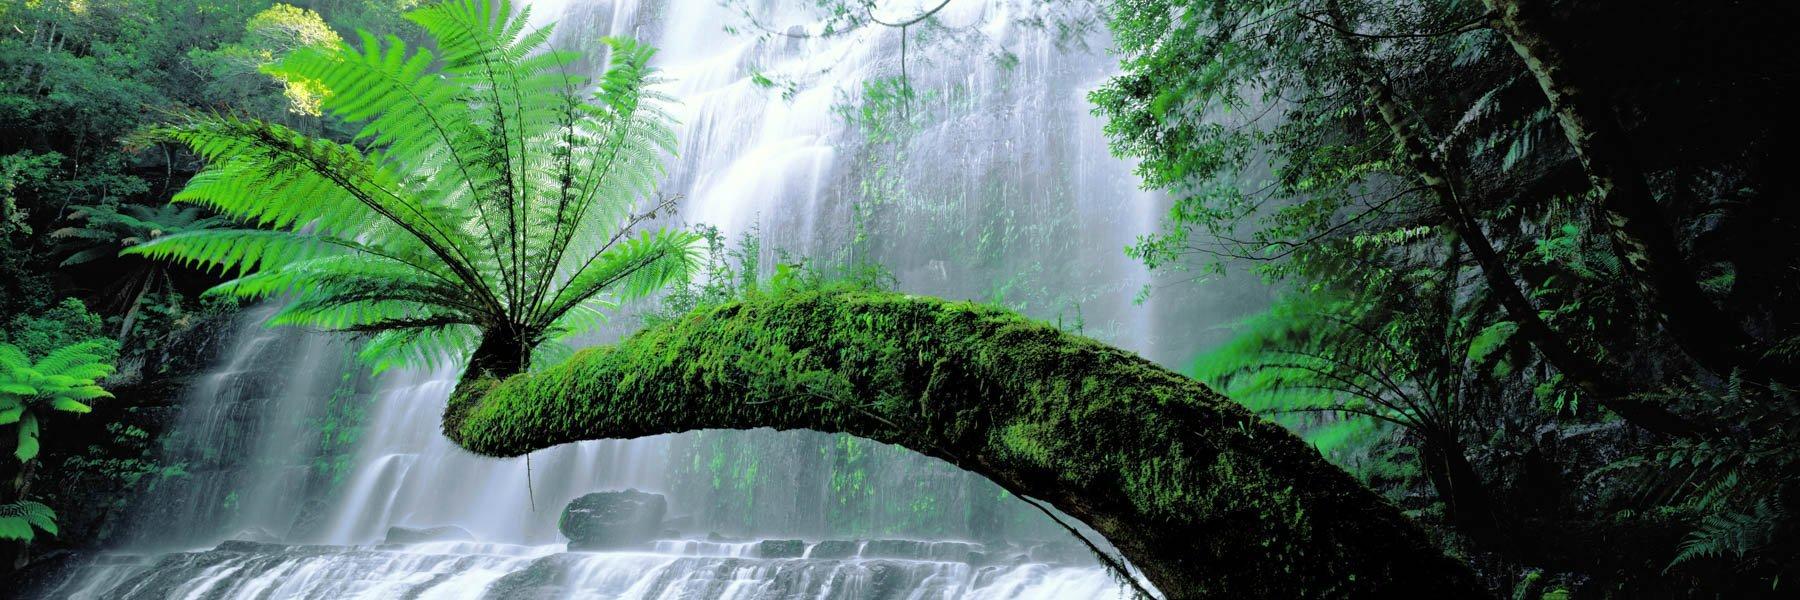 Plunging water forming a gossamer veil behind an ancient tree fern, Russell Falls, Tasmania, Australia.